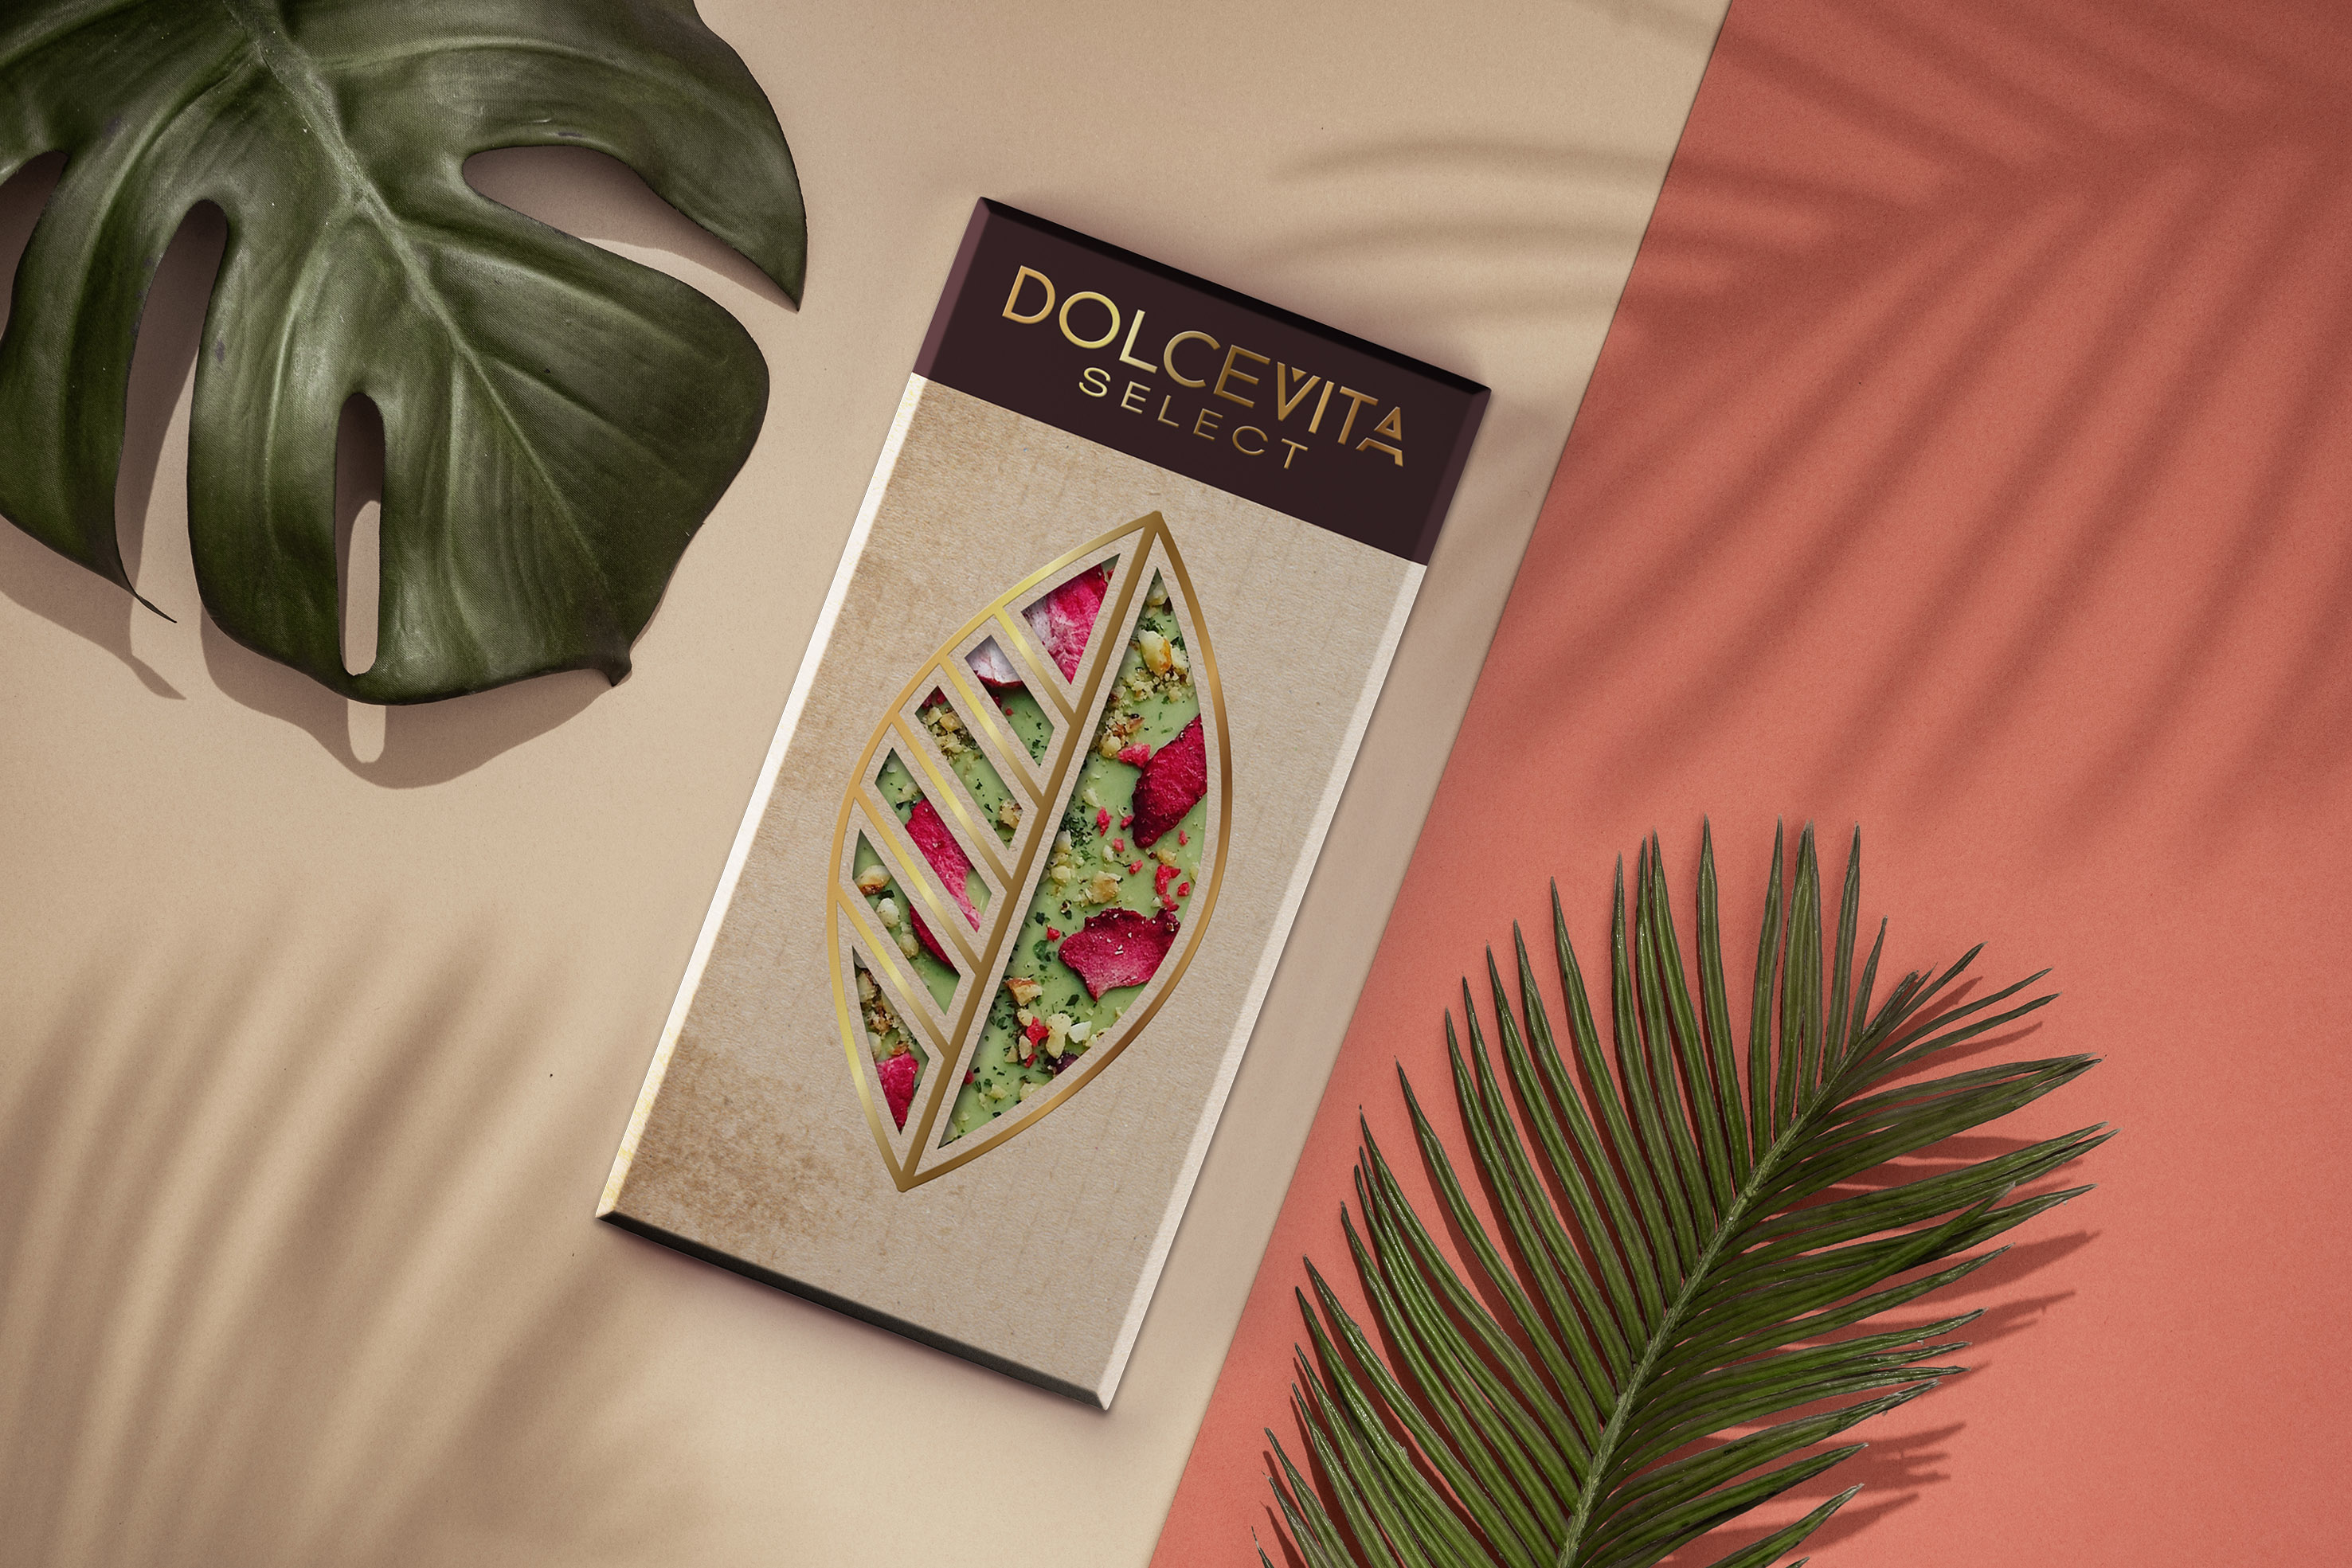 Packaging Design Concept for Chocolate Dolcevita by Alisa Vorkunova